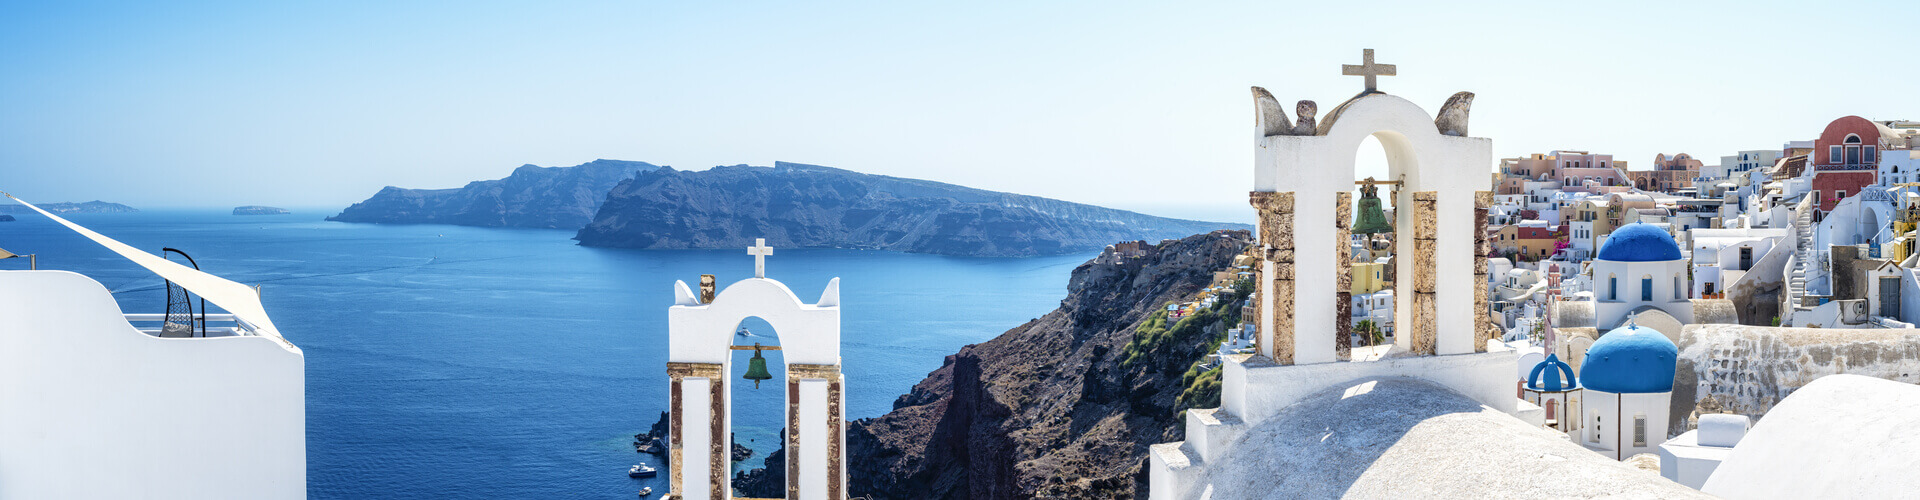 Explore-the-Famous-Blue-Domed-Churches-in-Santorini-Kamari-Tours-Excursions